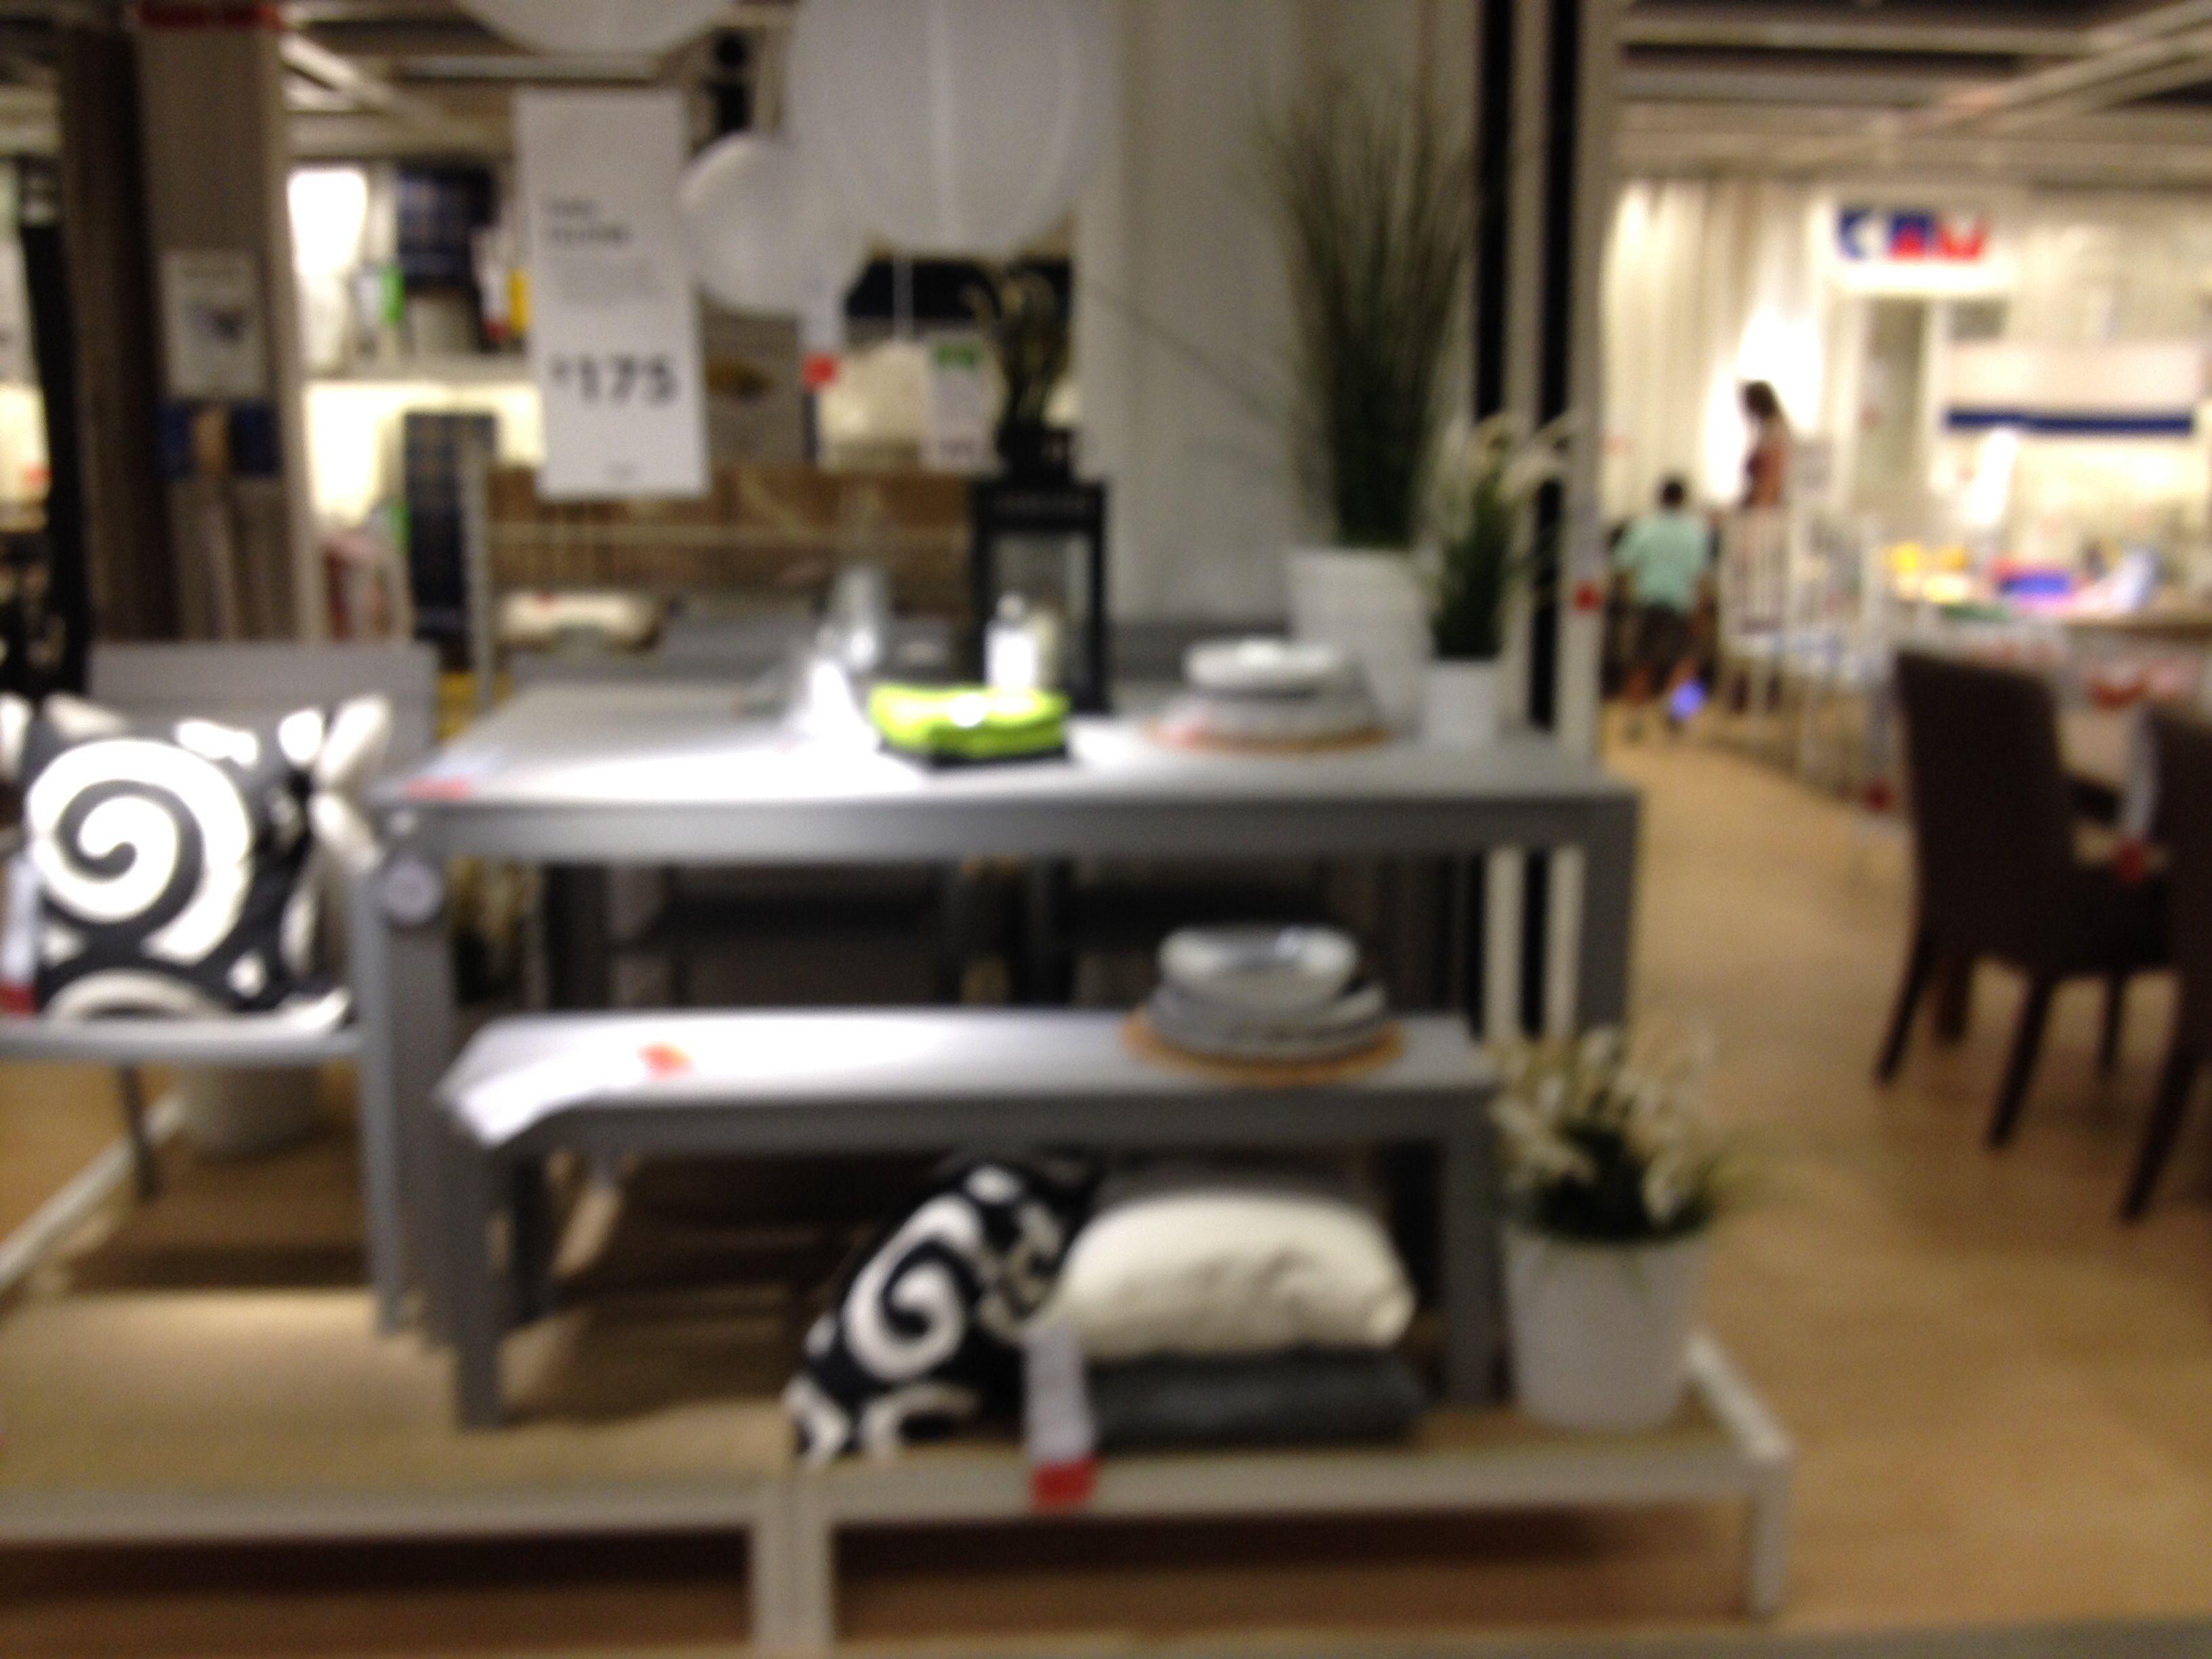 Glam esszimmer dekor indooroutdoor table and chairs at ikea  outdoor furniture